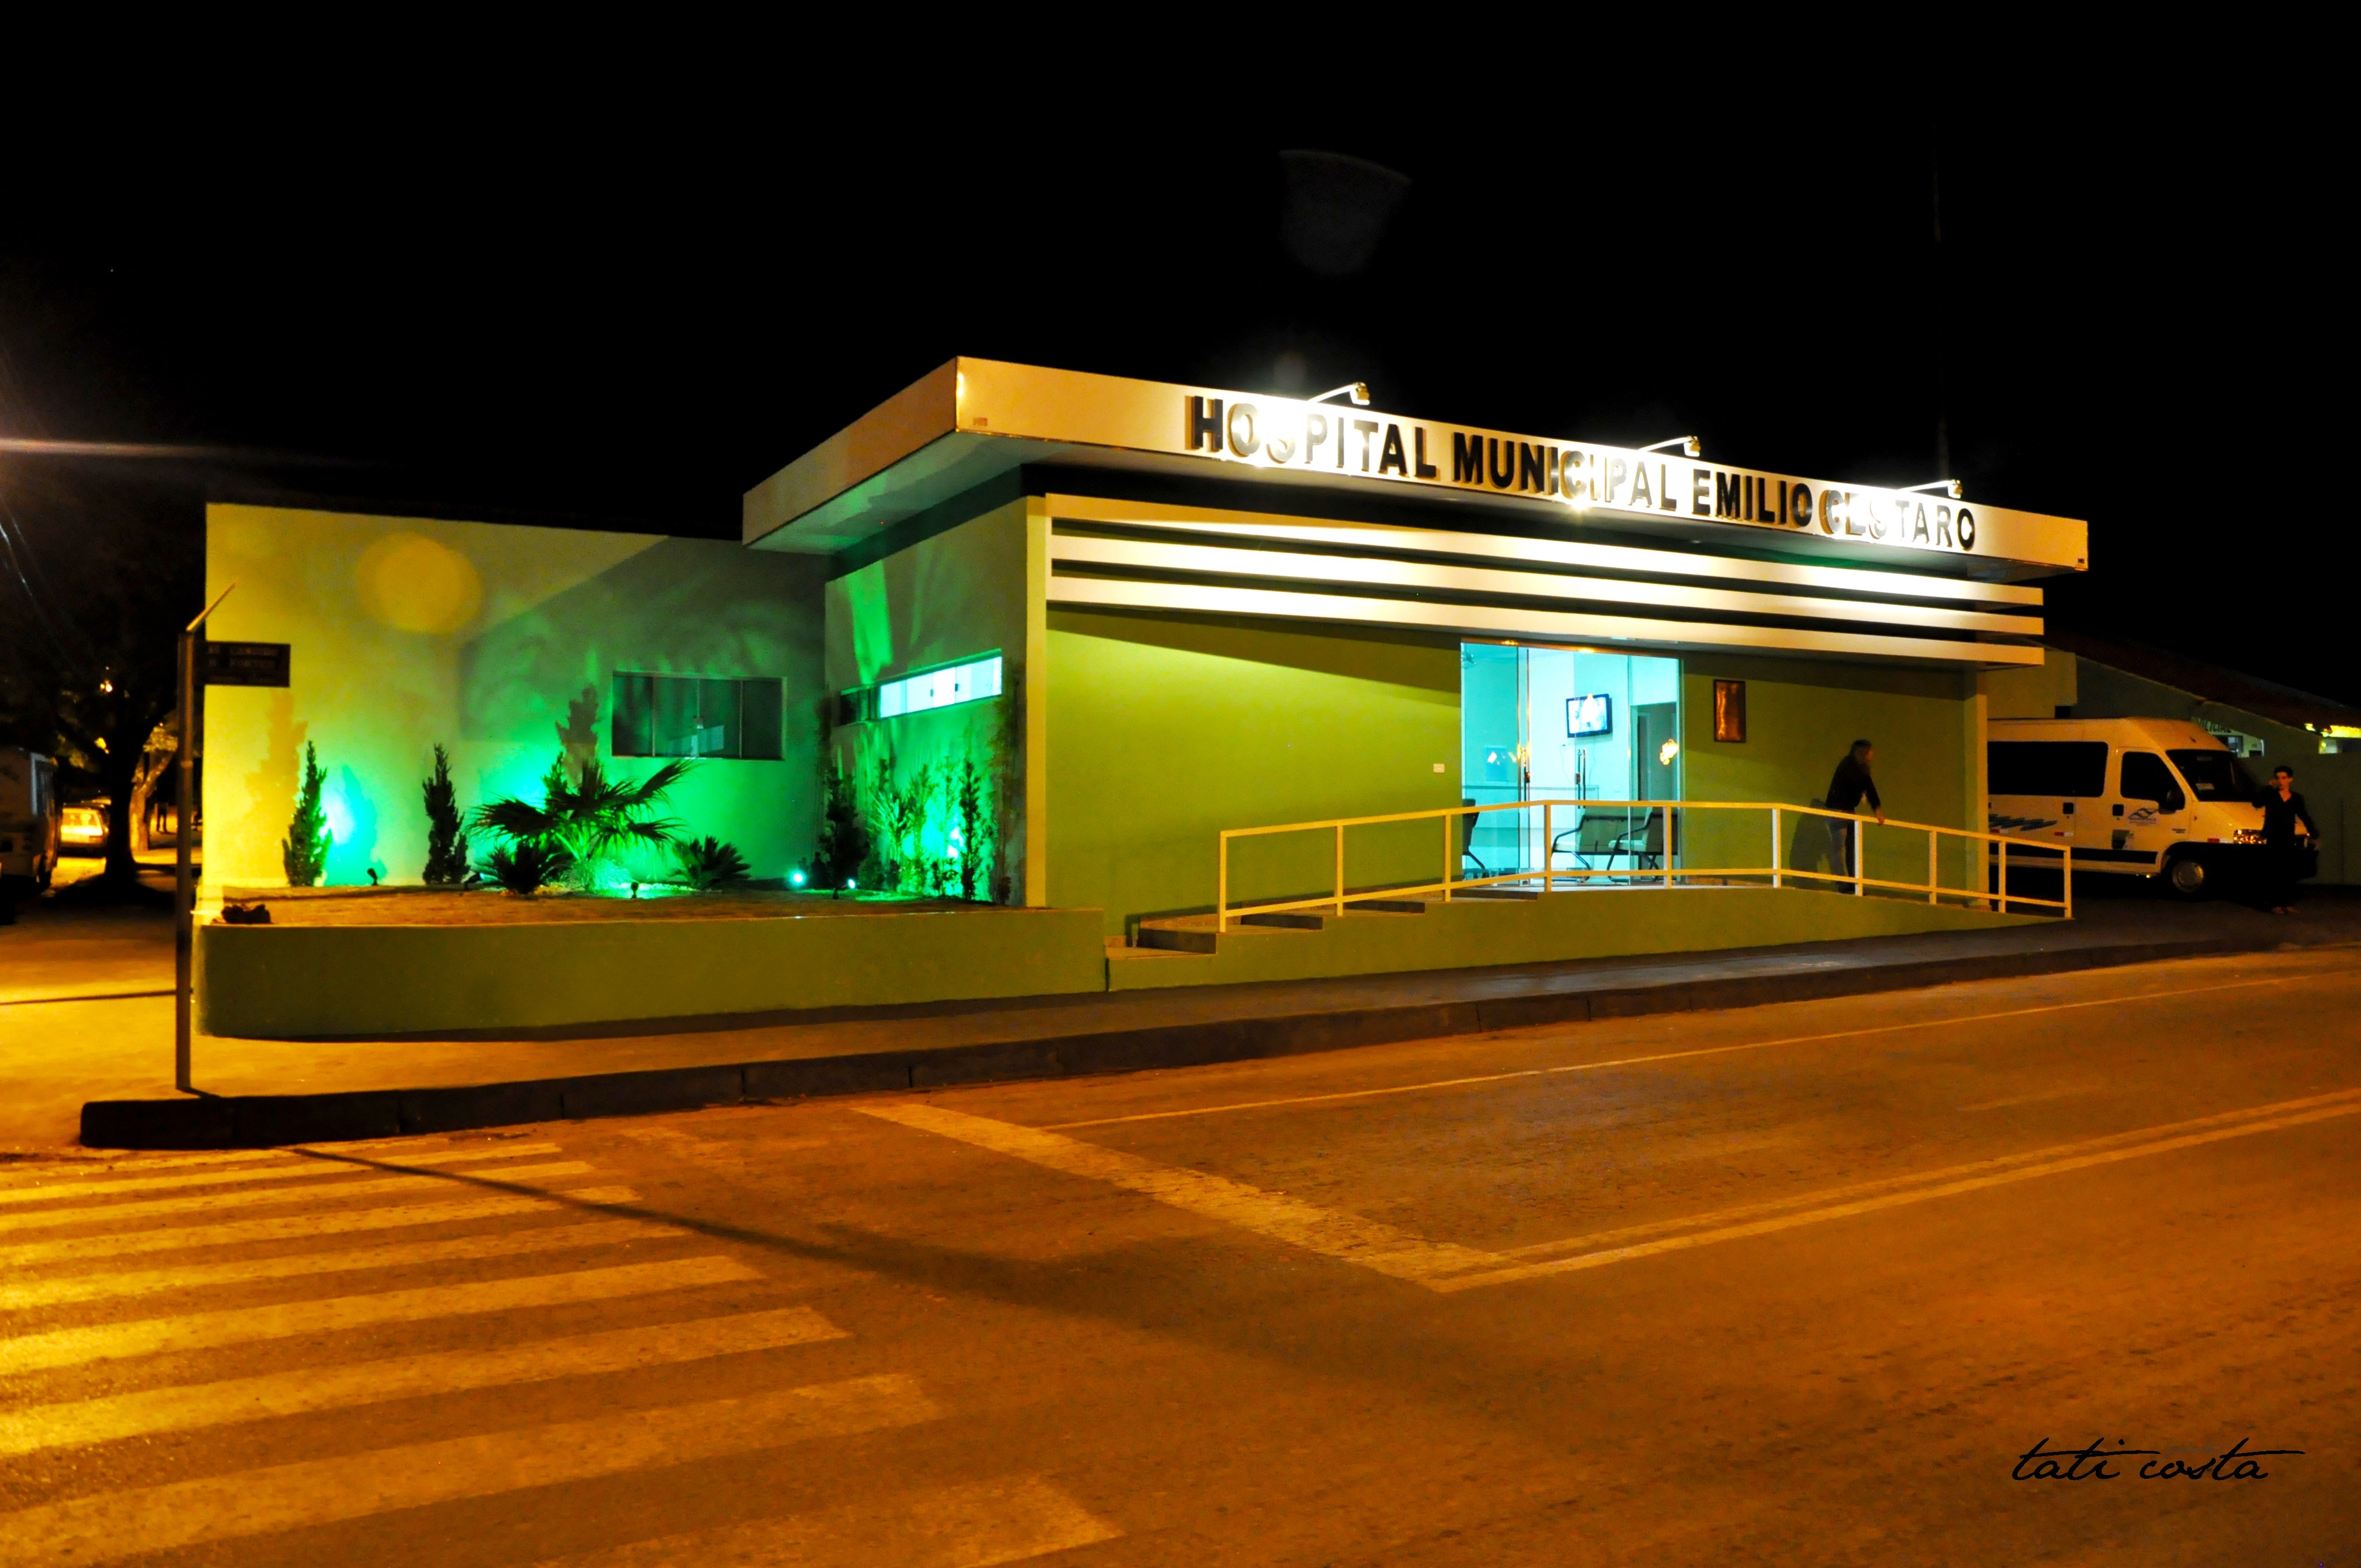 01 - Hospital Municipal Emilio Cestaro